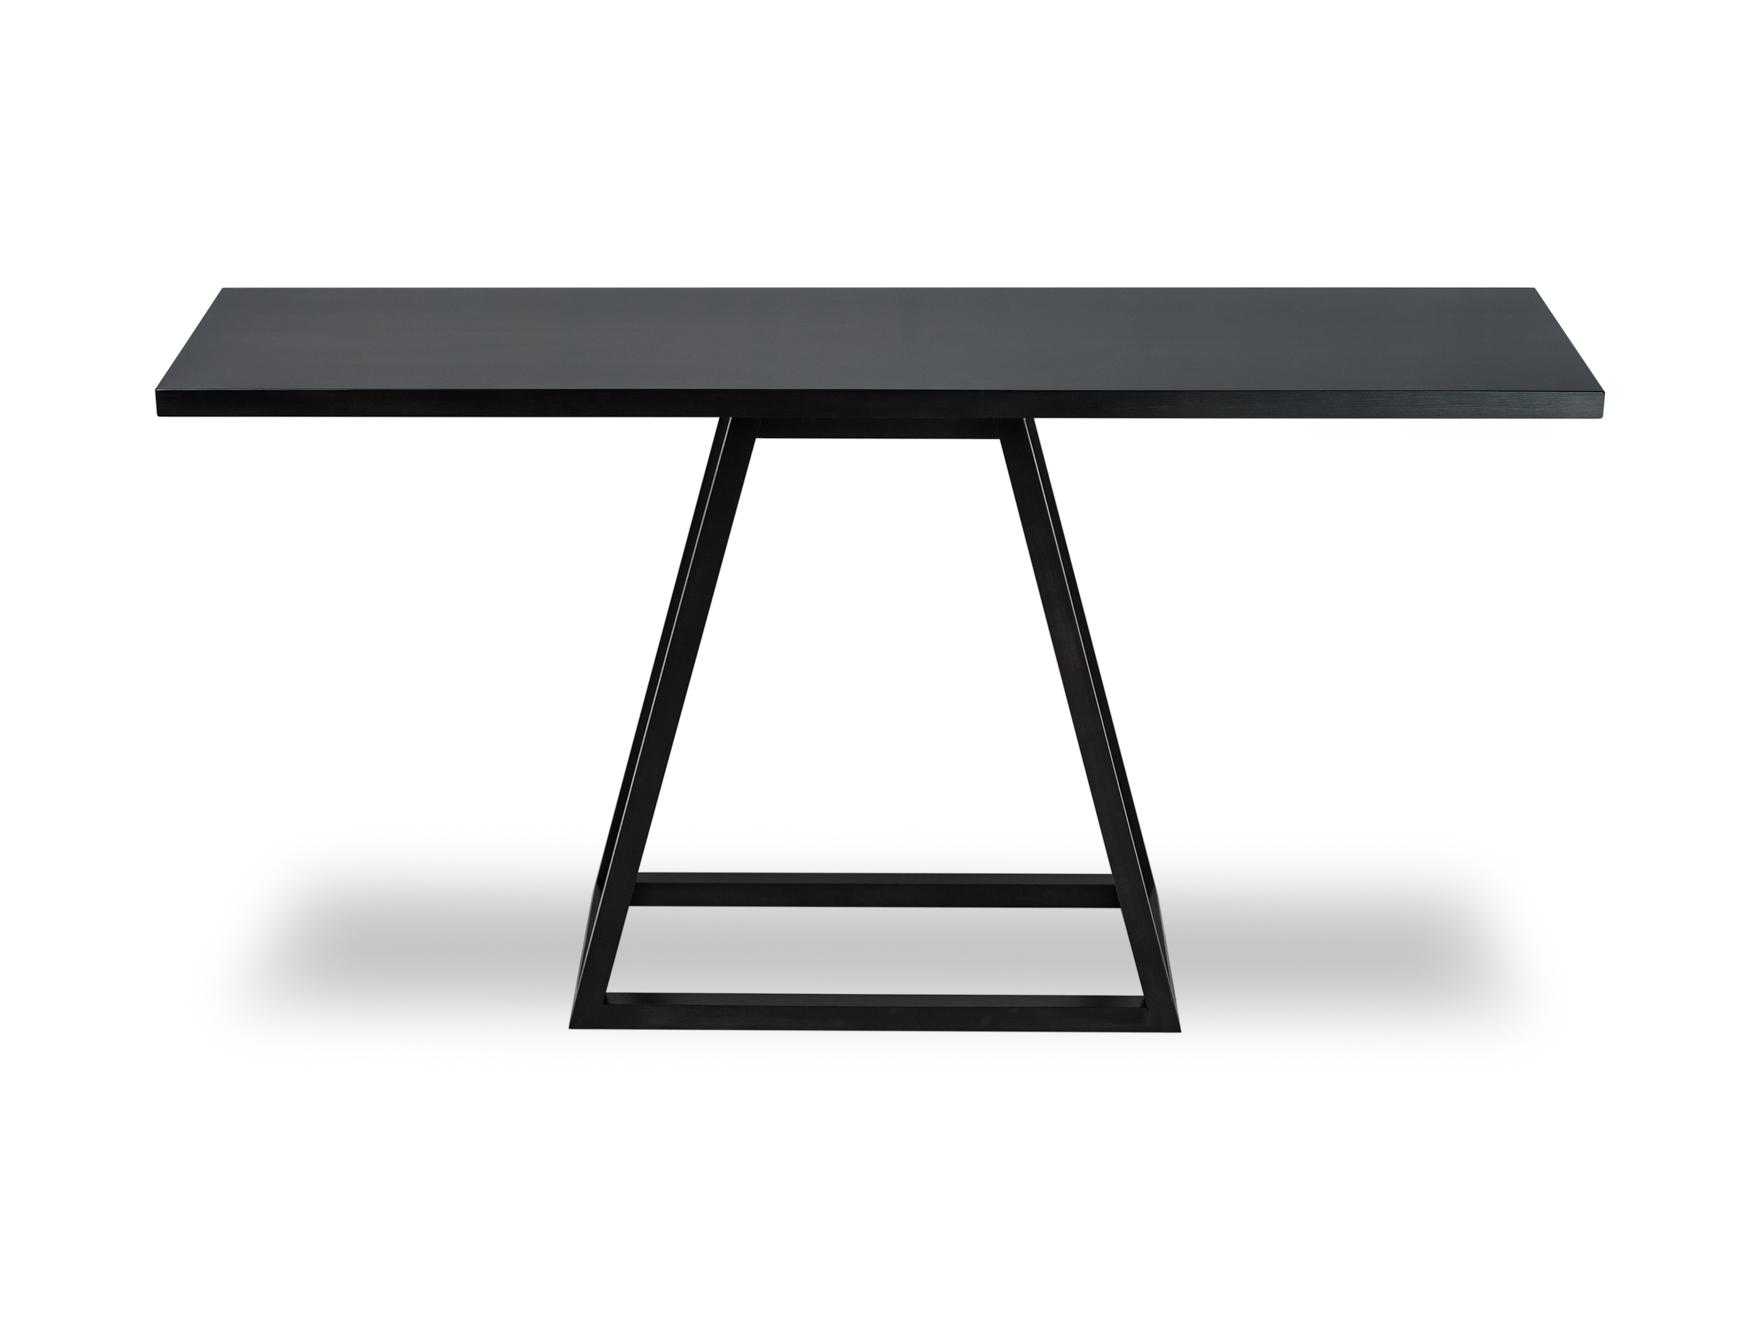 005_Woodcraft_Furniture_AvenueSofaTable_FrontB.jpg